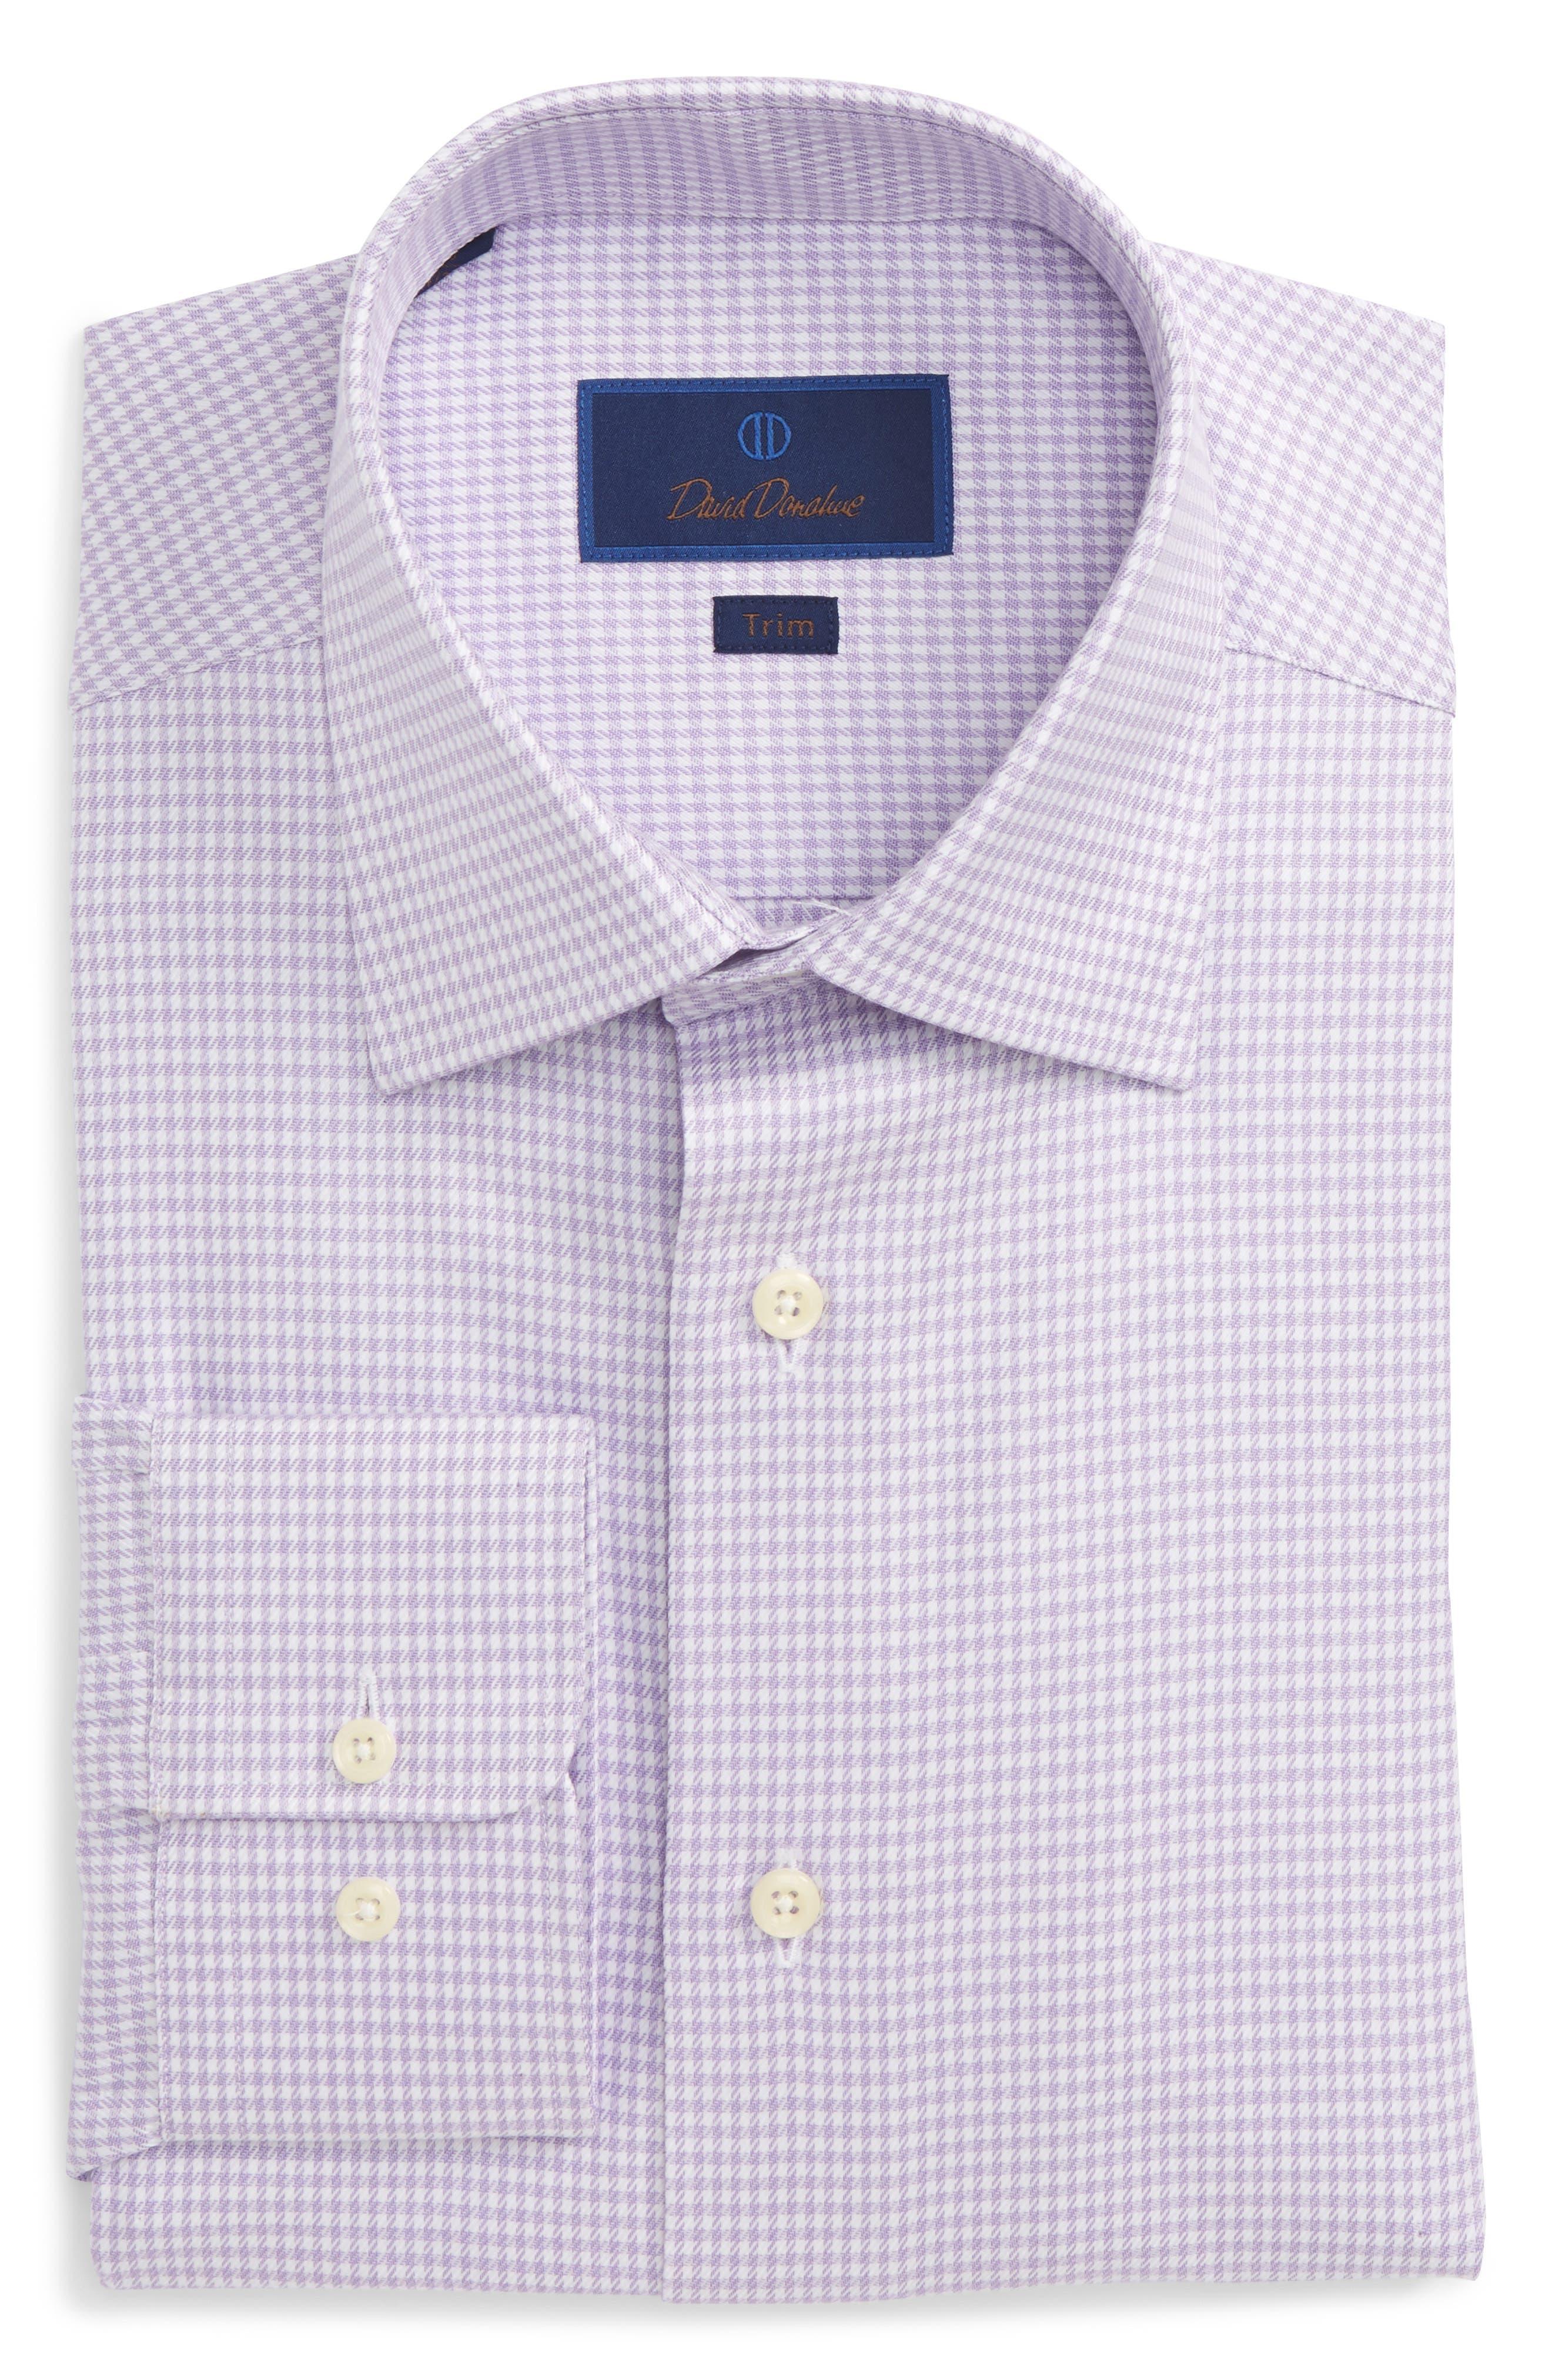 Trim Fit Houndstooth Dress Shirt,                         Main,                         color, Lilac